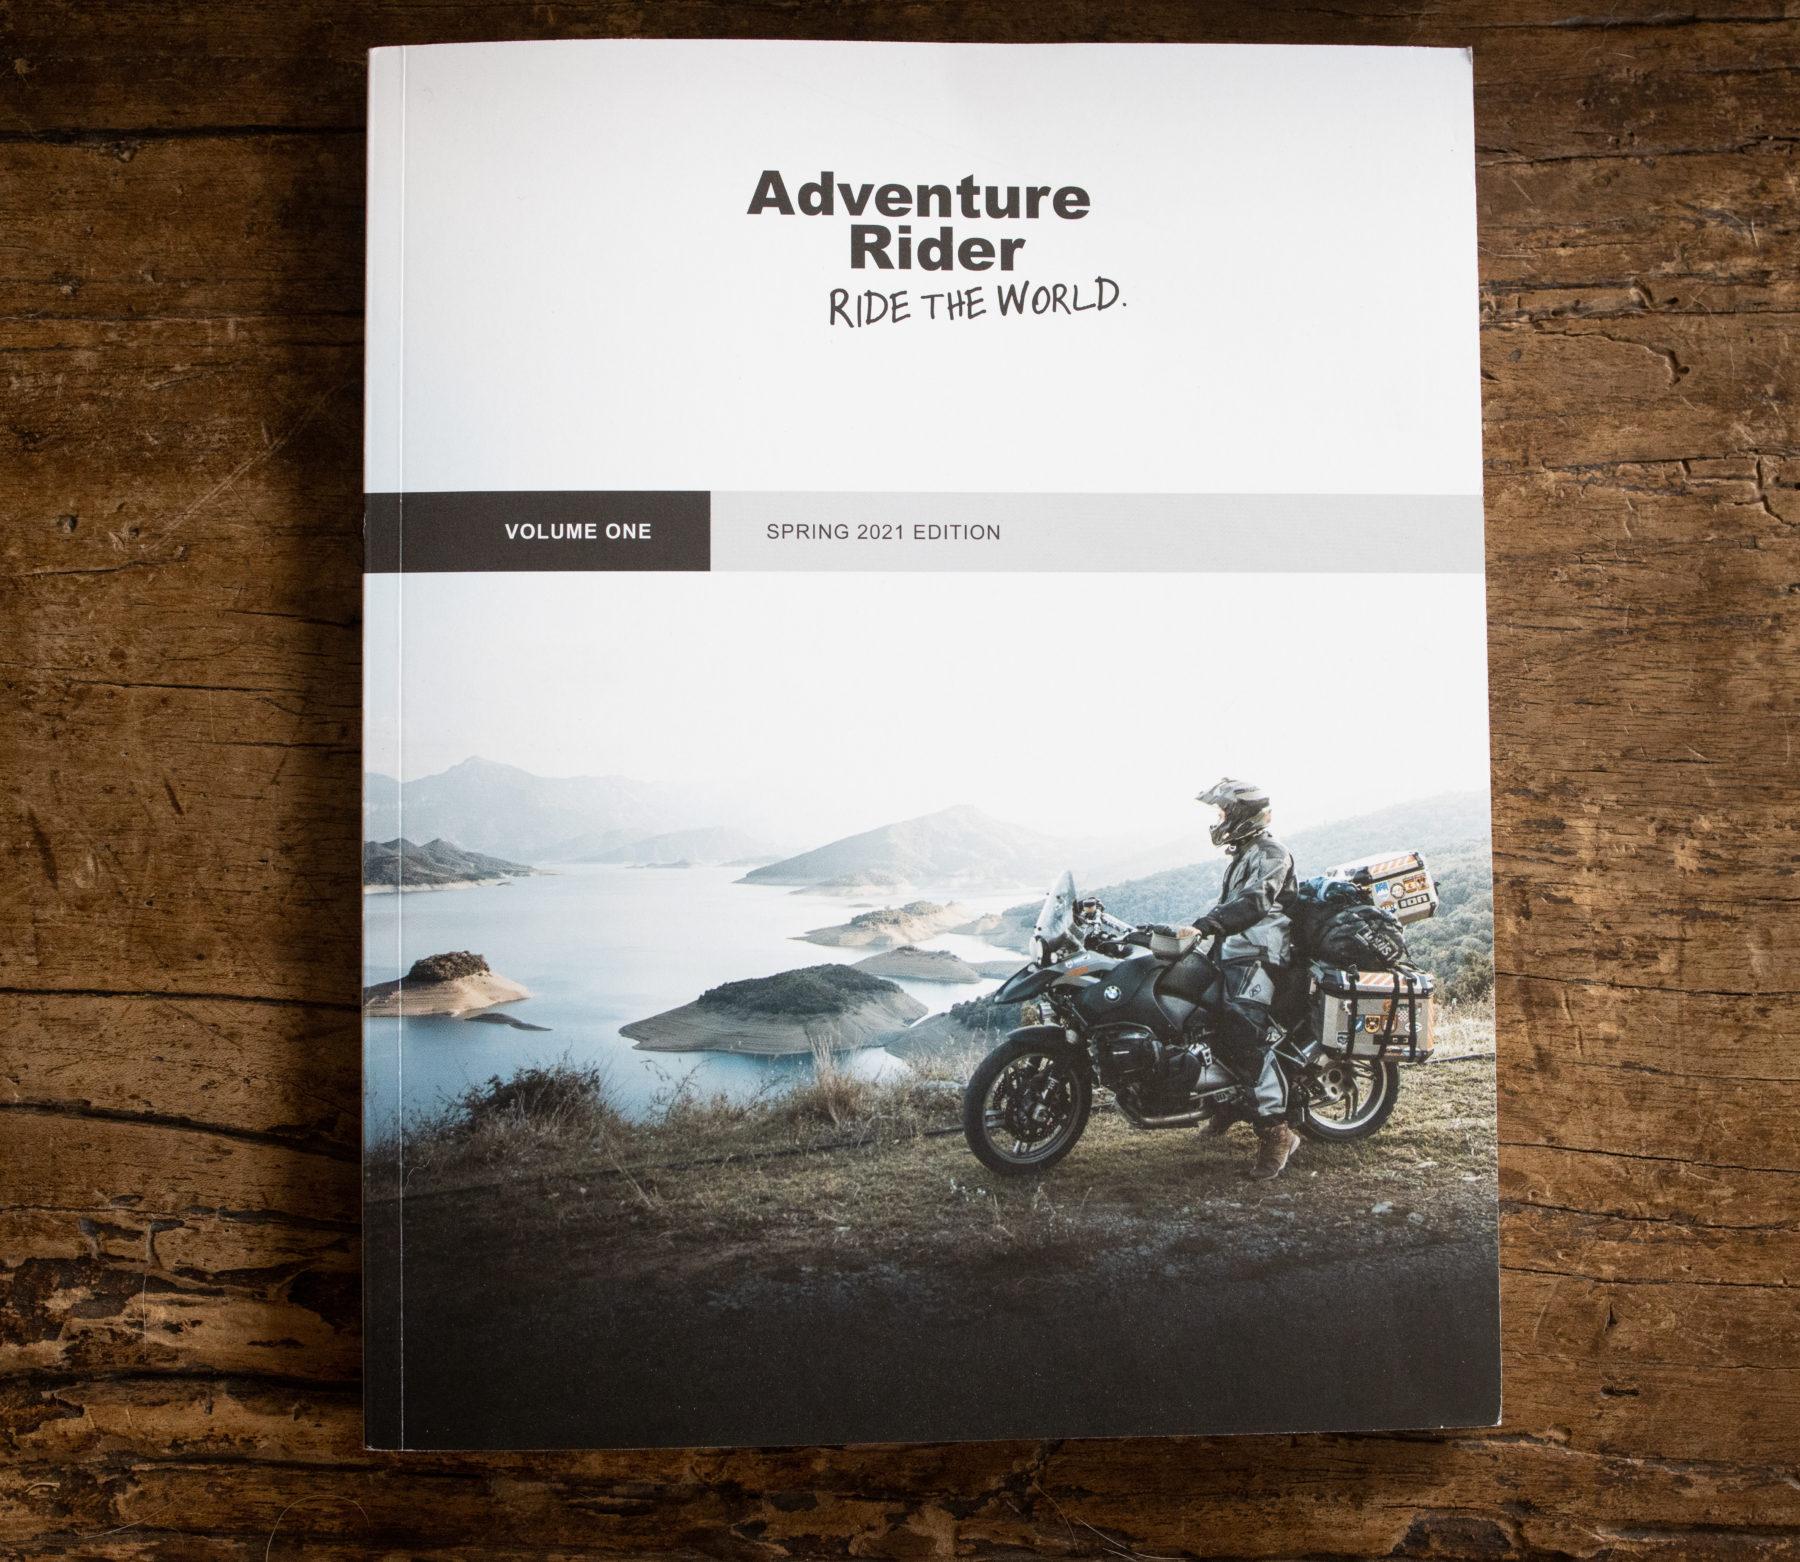 Adventure Rider Magazine Volume 1 Spring Edition 2021